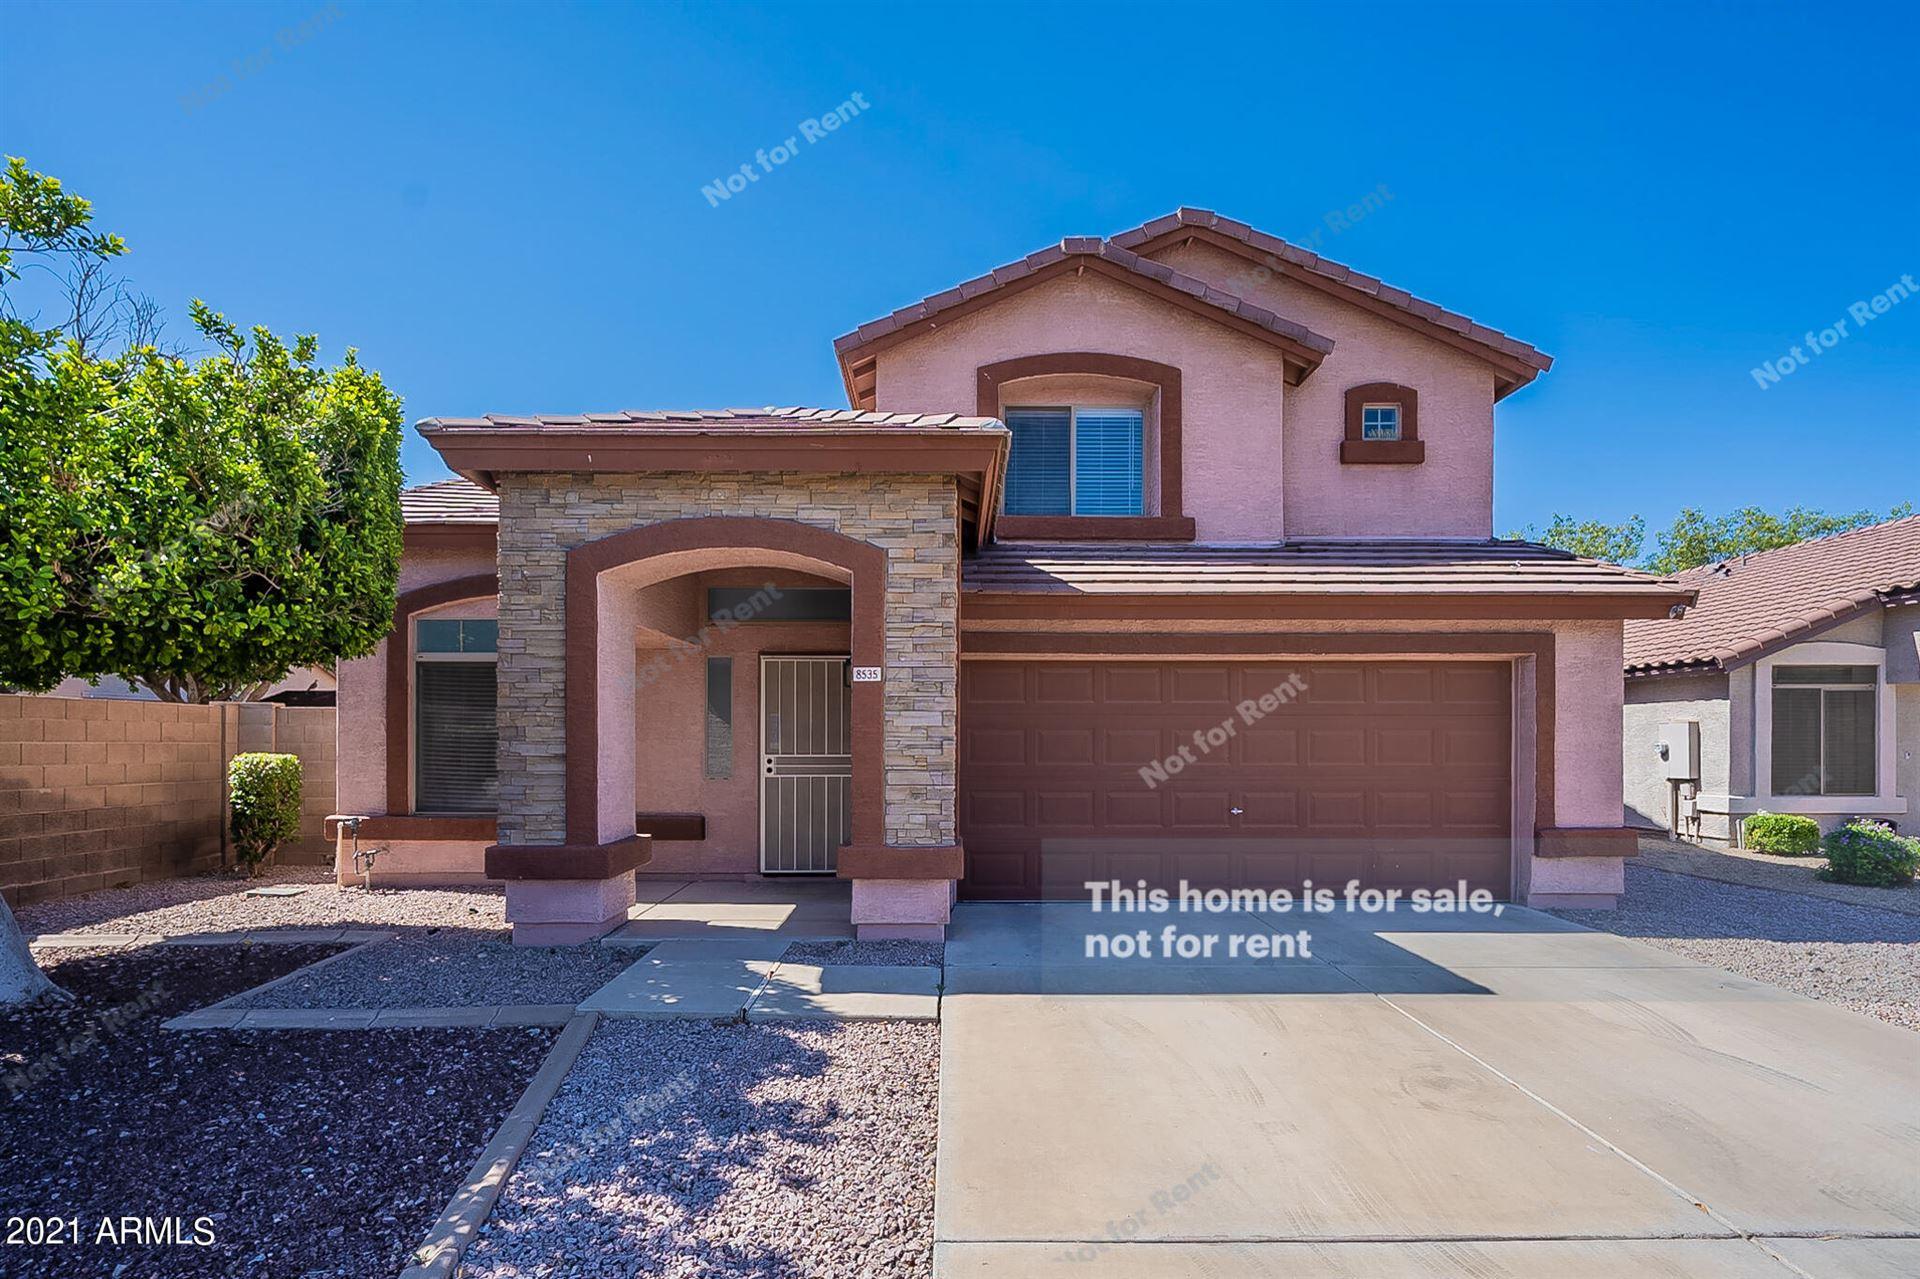 8535 W VOGEL Avenue, Peoria, AZ 85345 - MLS#: 6232906